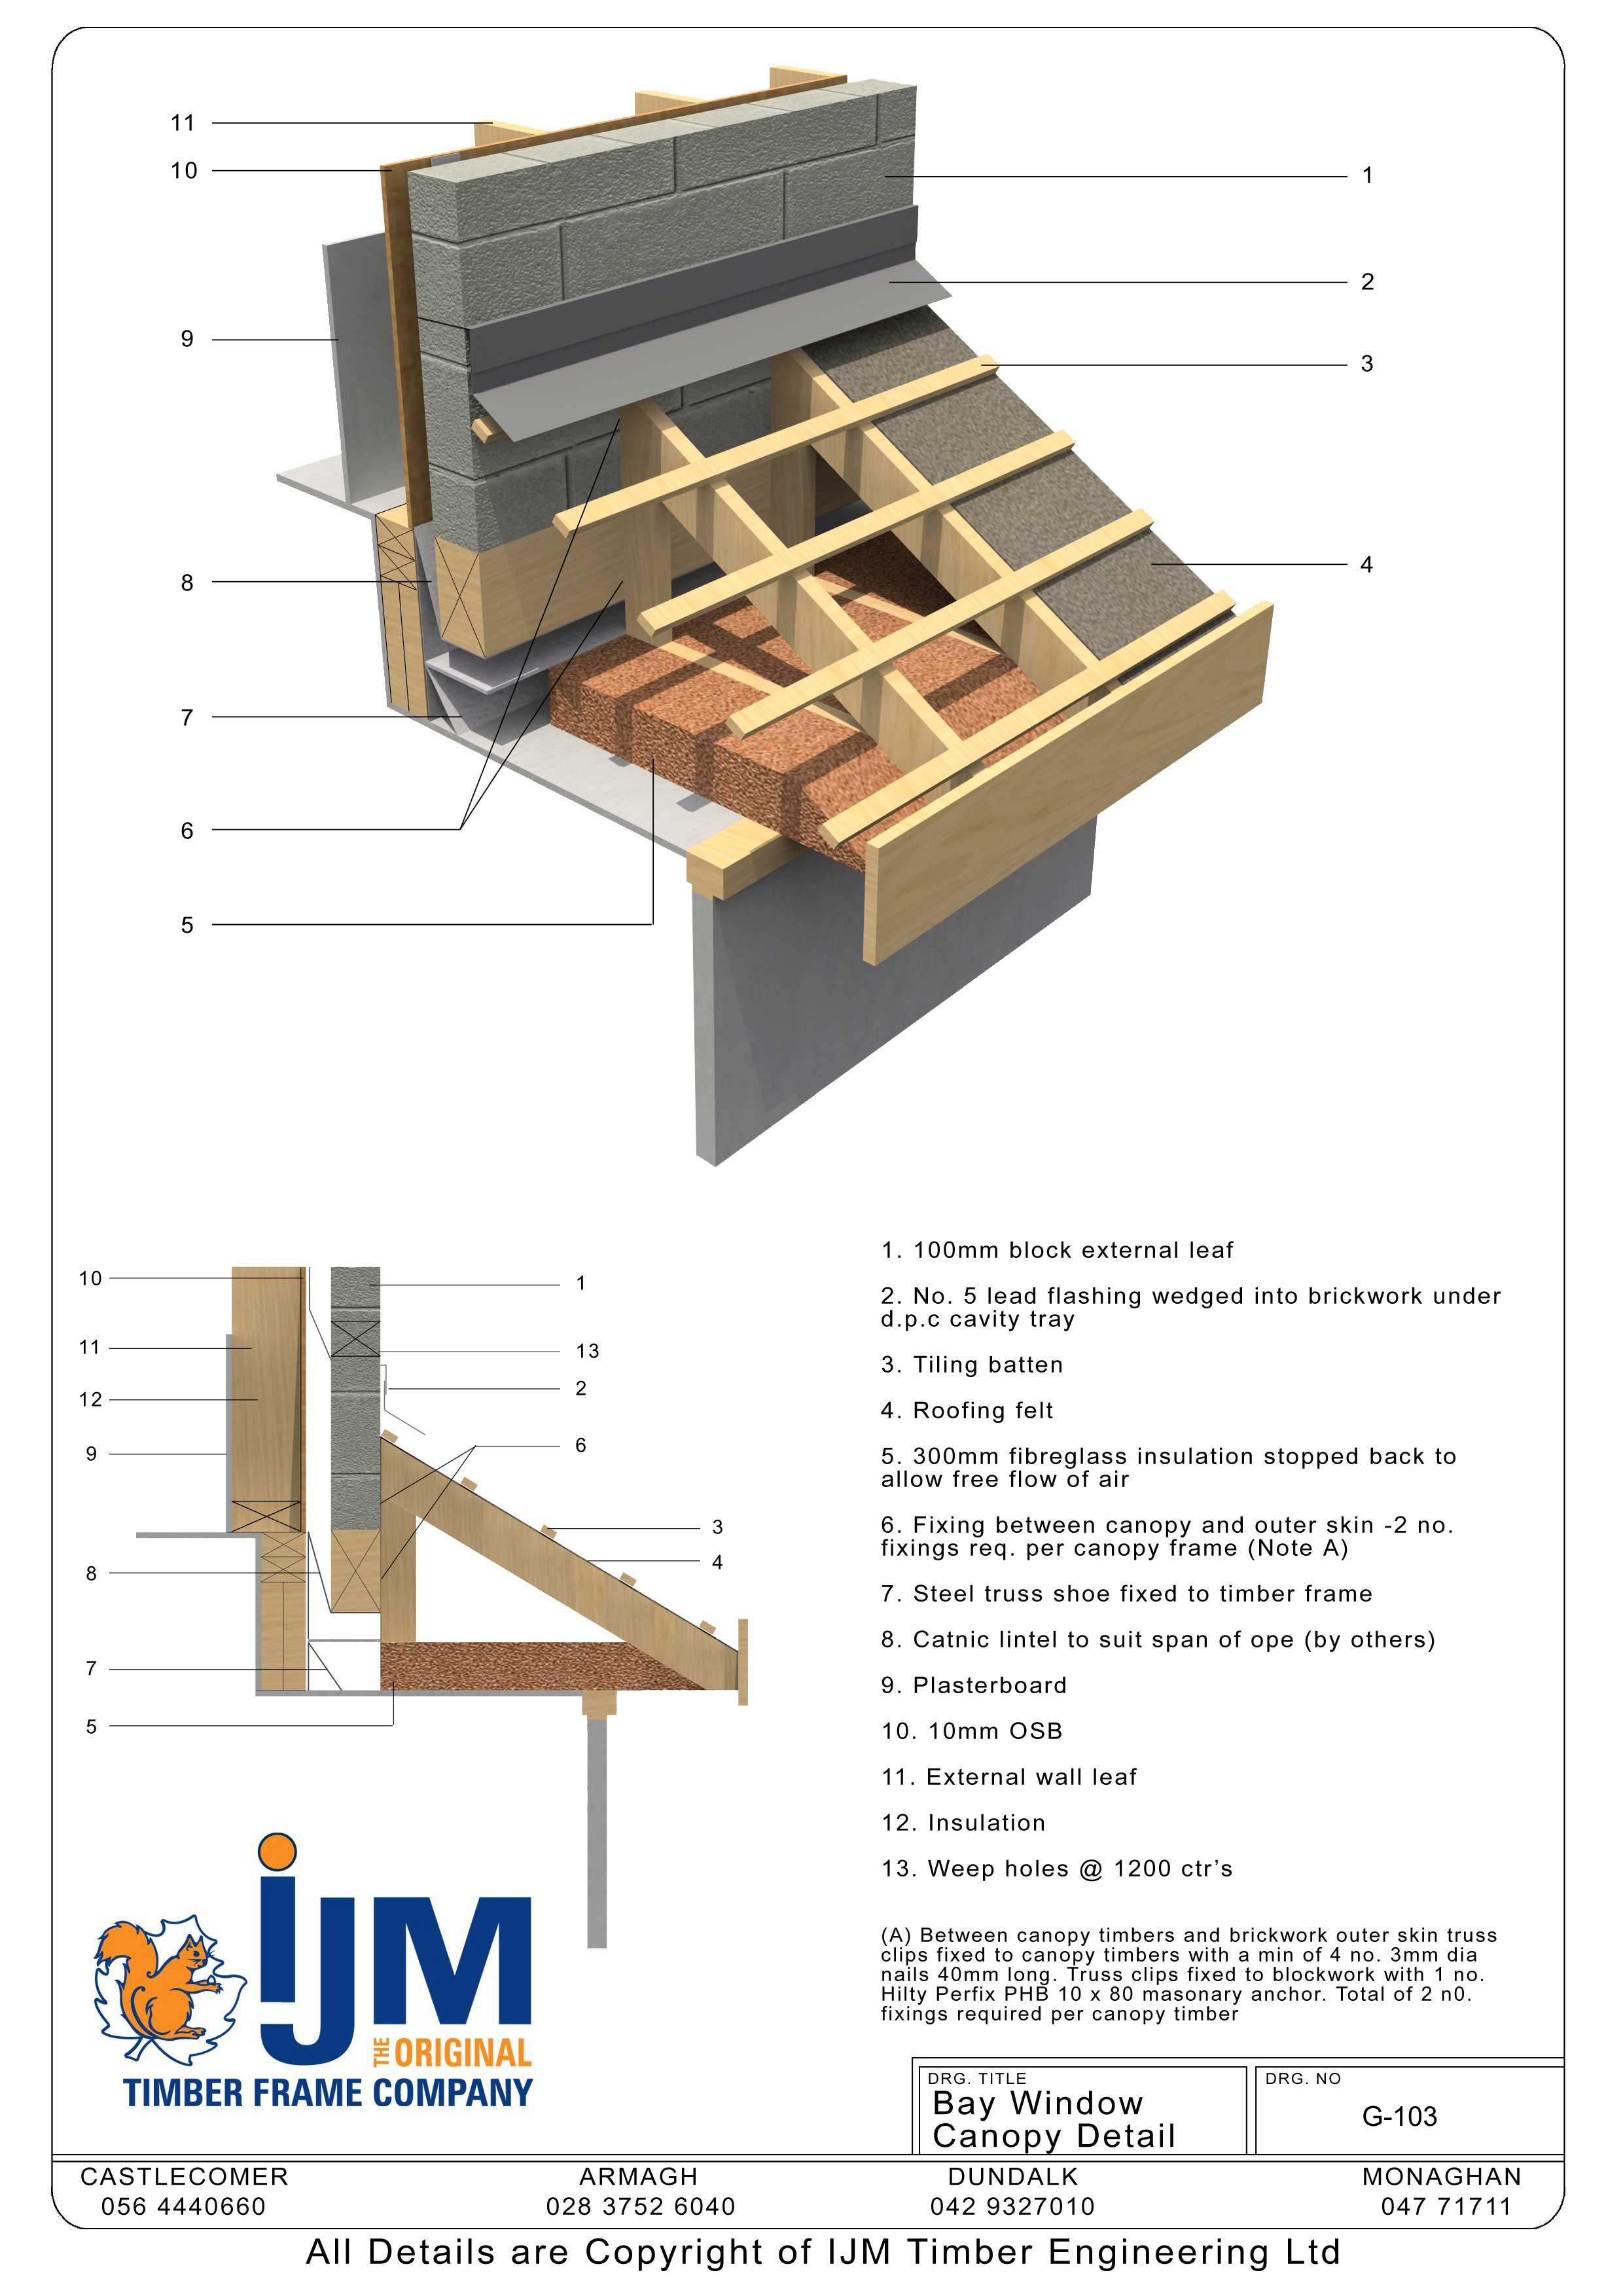 IJM Timberframe - Technical Details - Book of Details